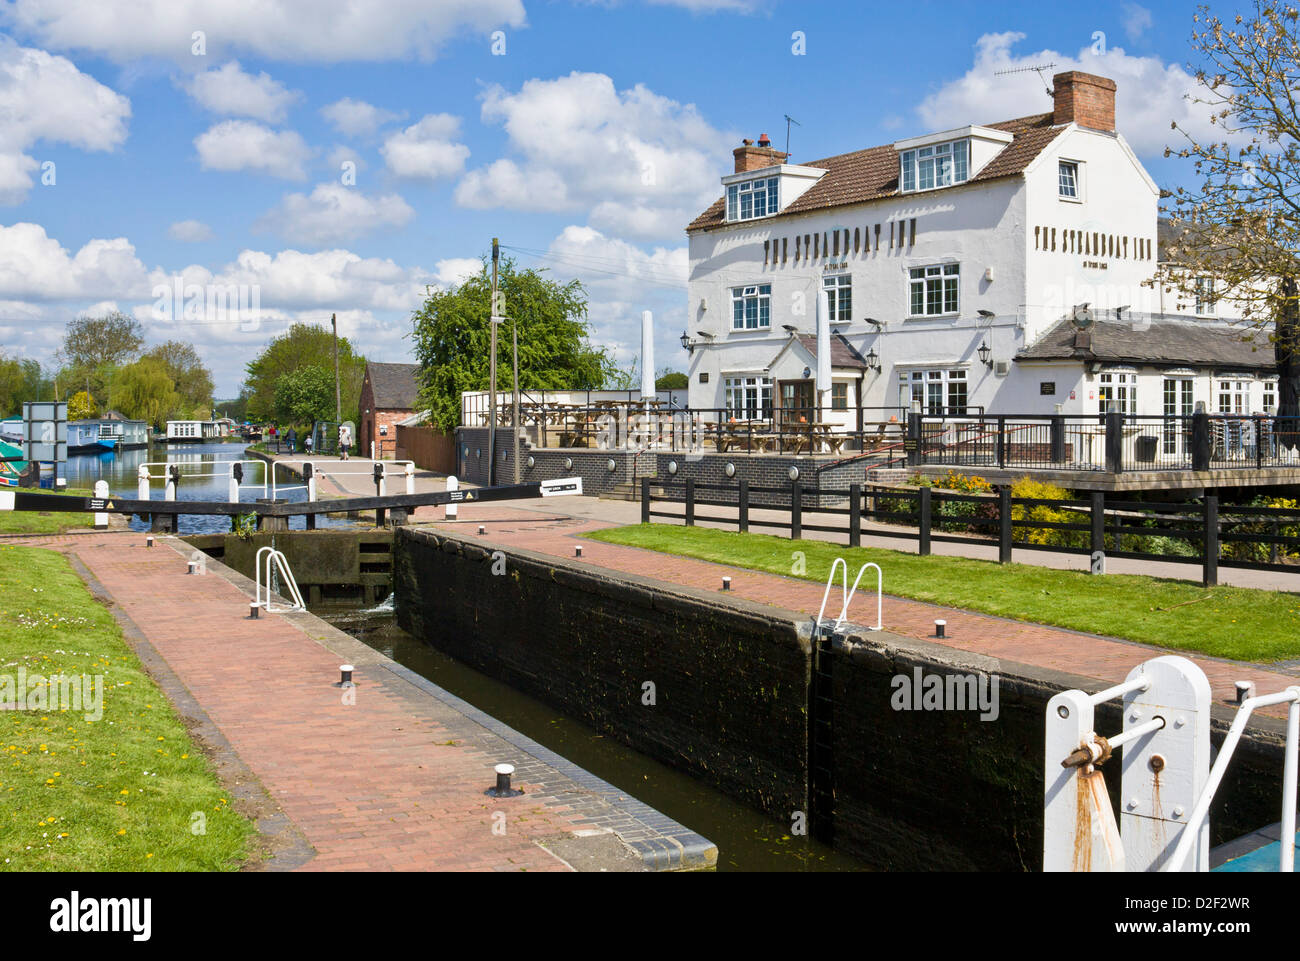 The Steamboat Inn at Trent Lock, Sawley near Long Eaton, Derbyshire, England, GB, UK, EU, Europe - Stock Image